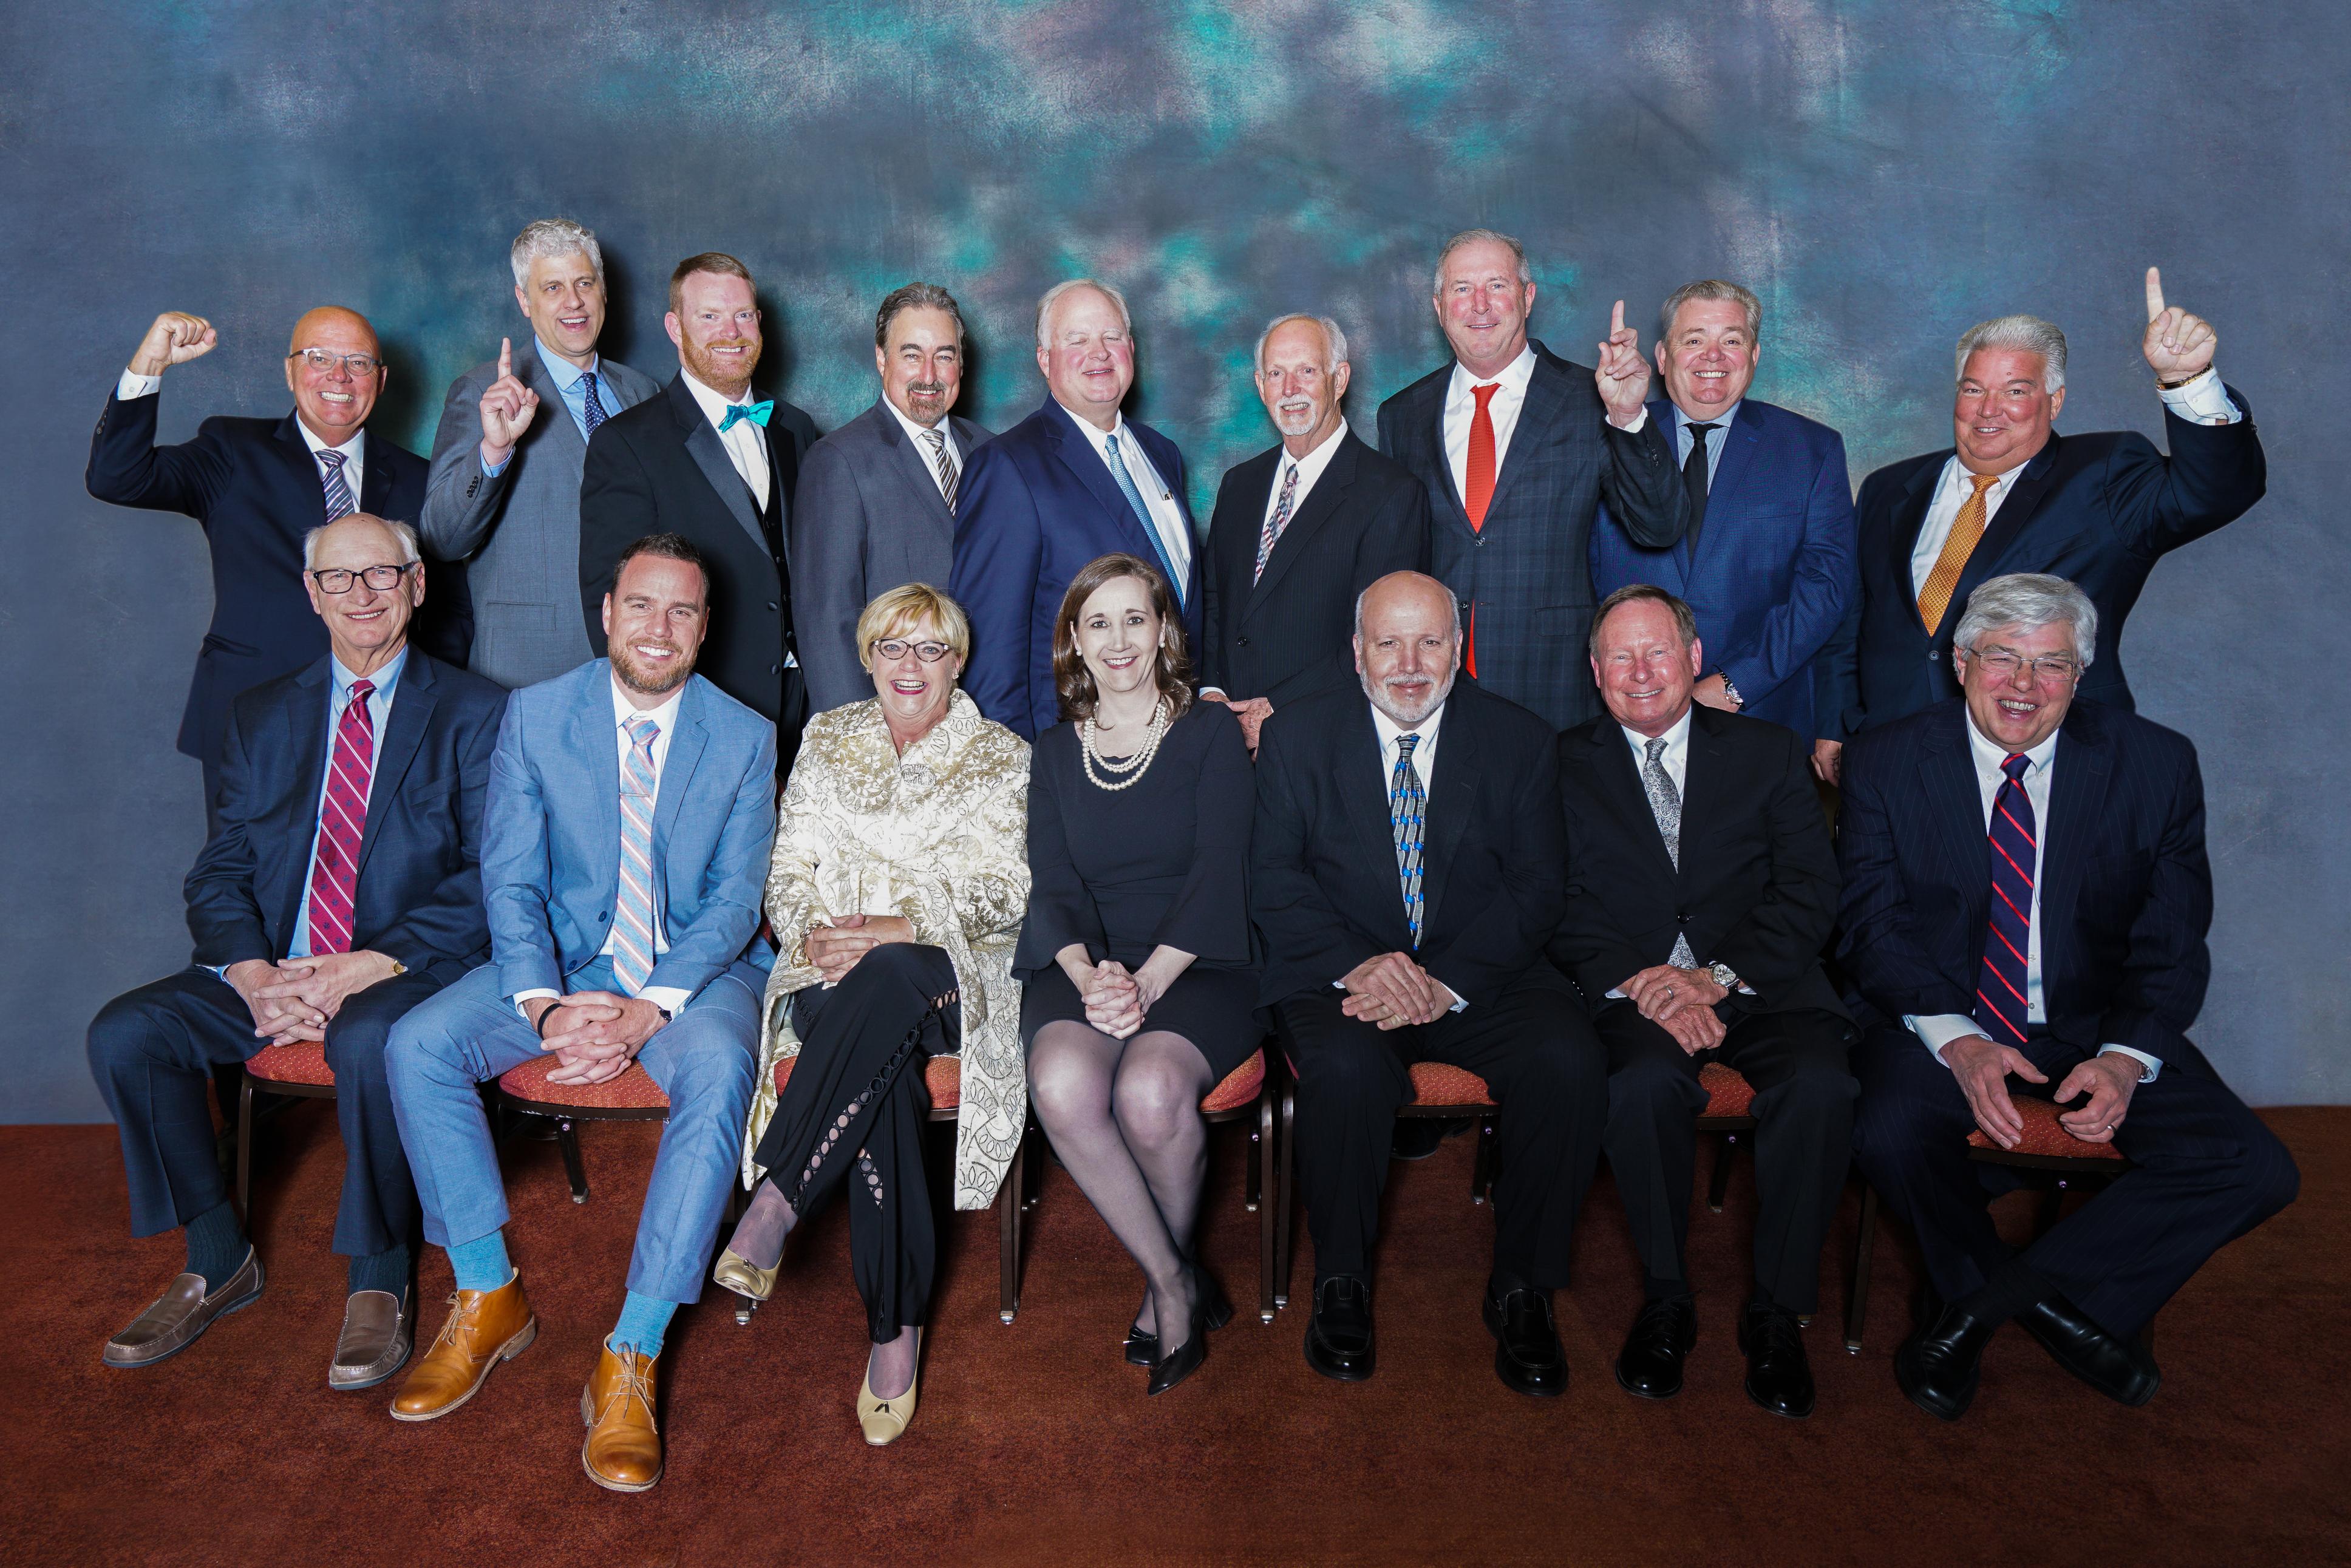 2017 Presidents Award Winners Group Photo